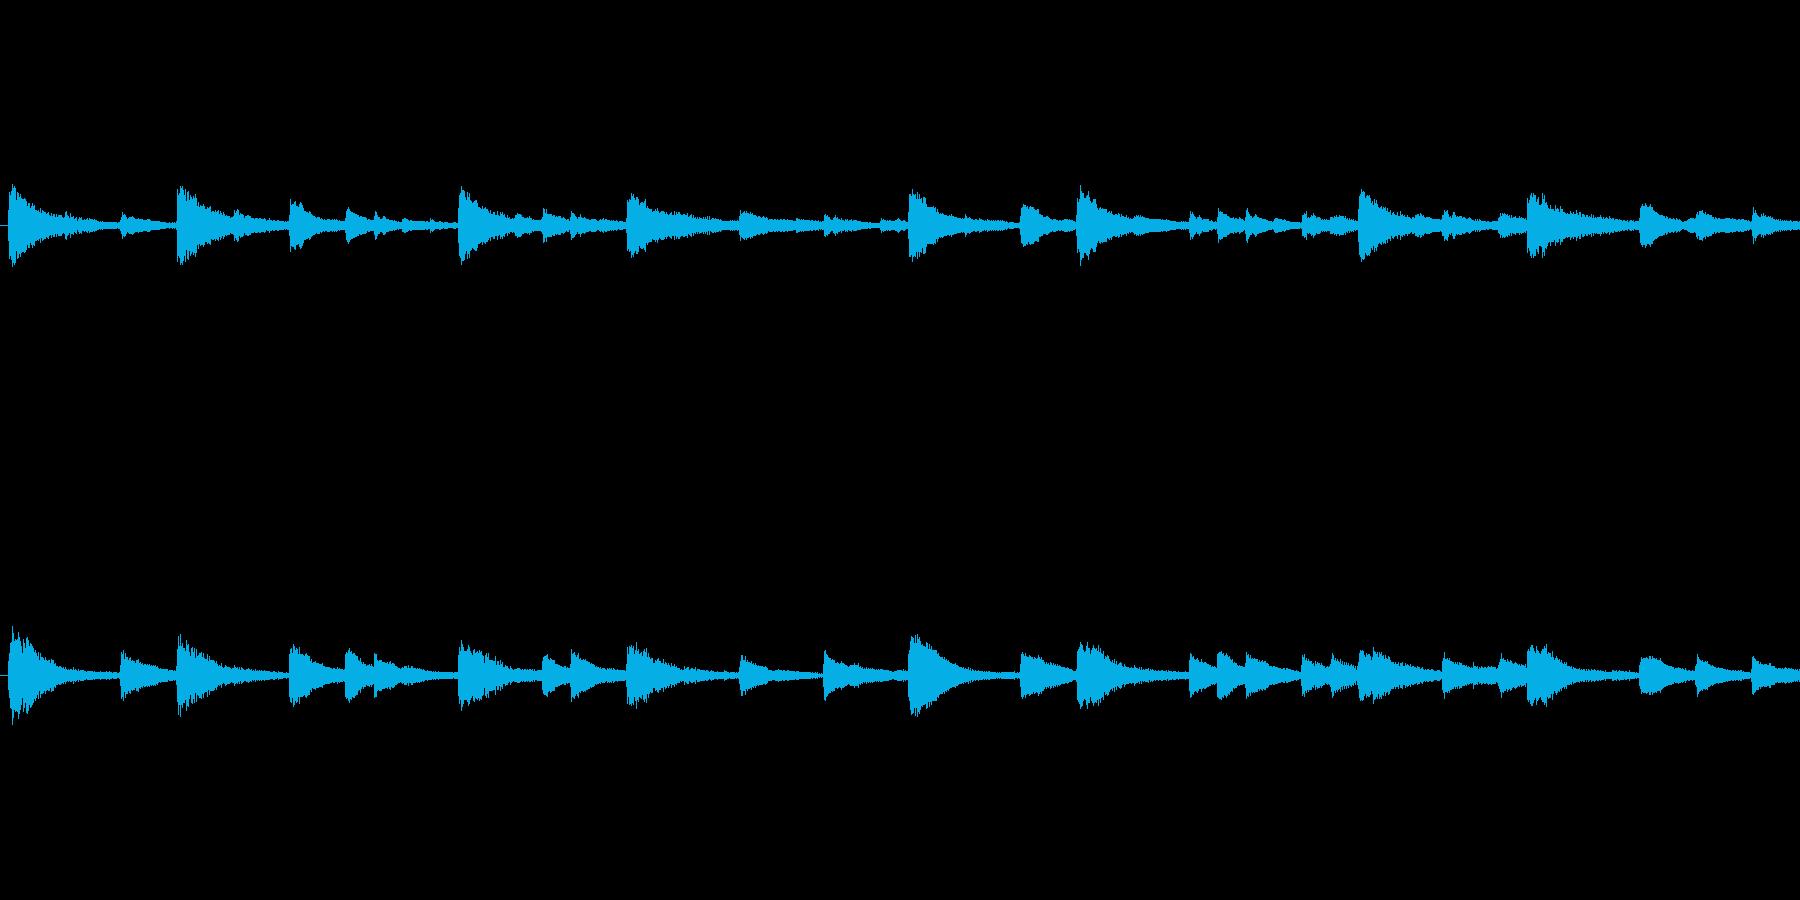 piano loop ピアノループの再生済みの波形